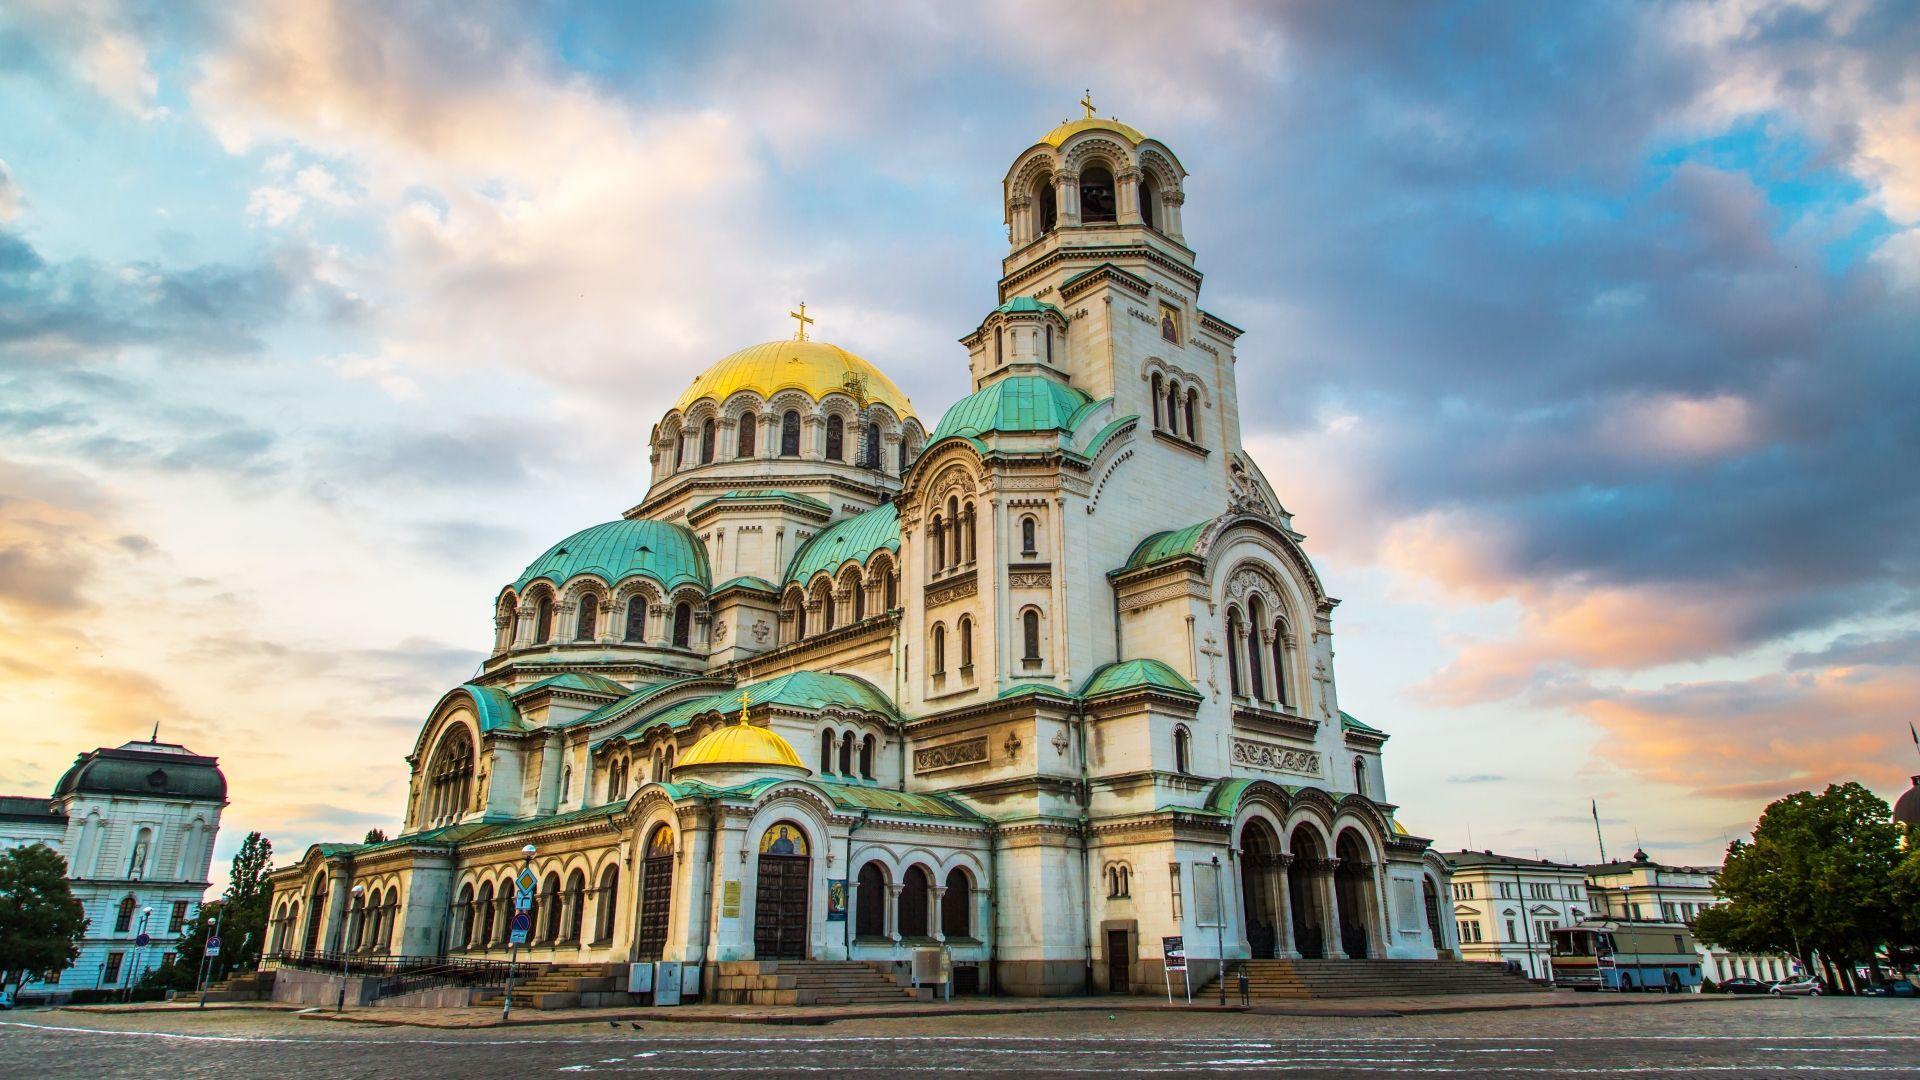 Šv. Alexander Nevski Katedra